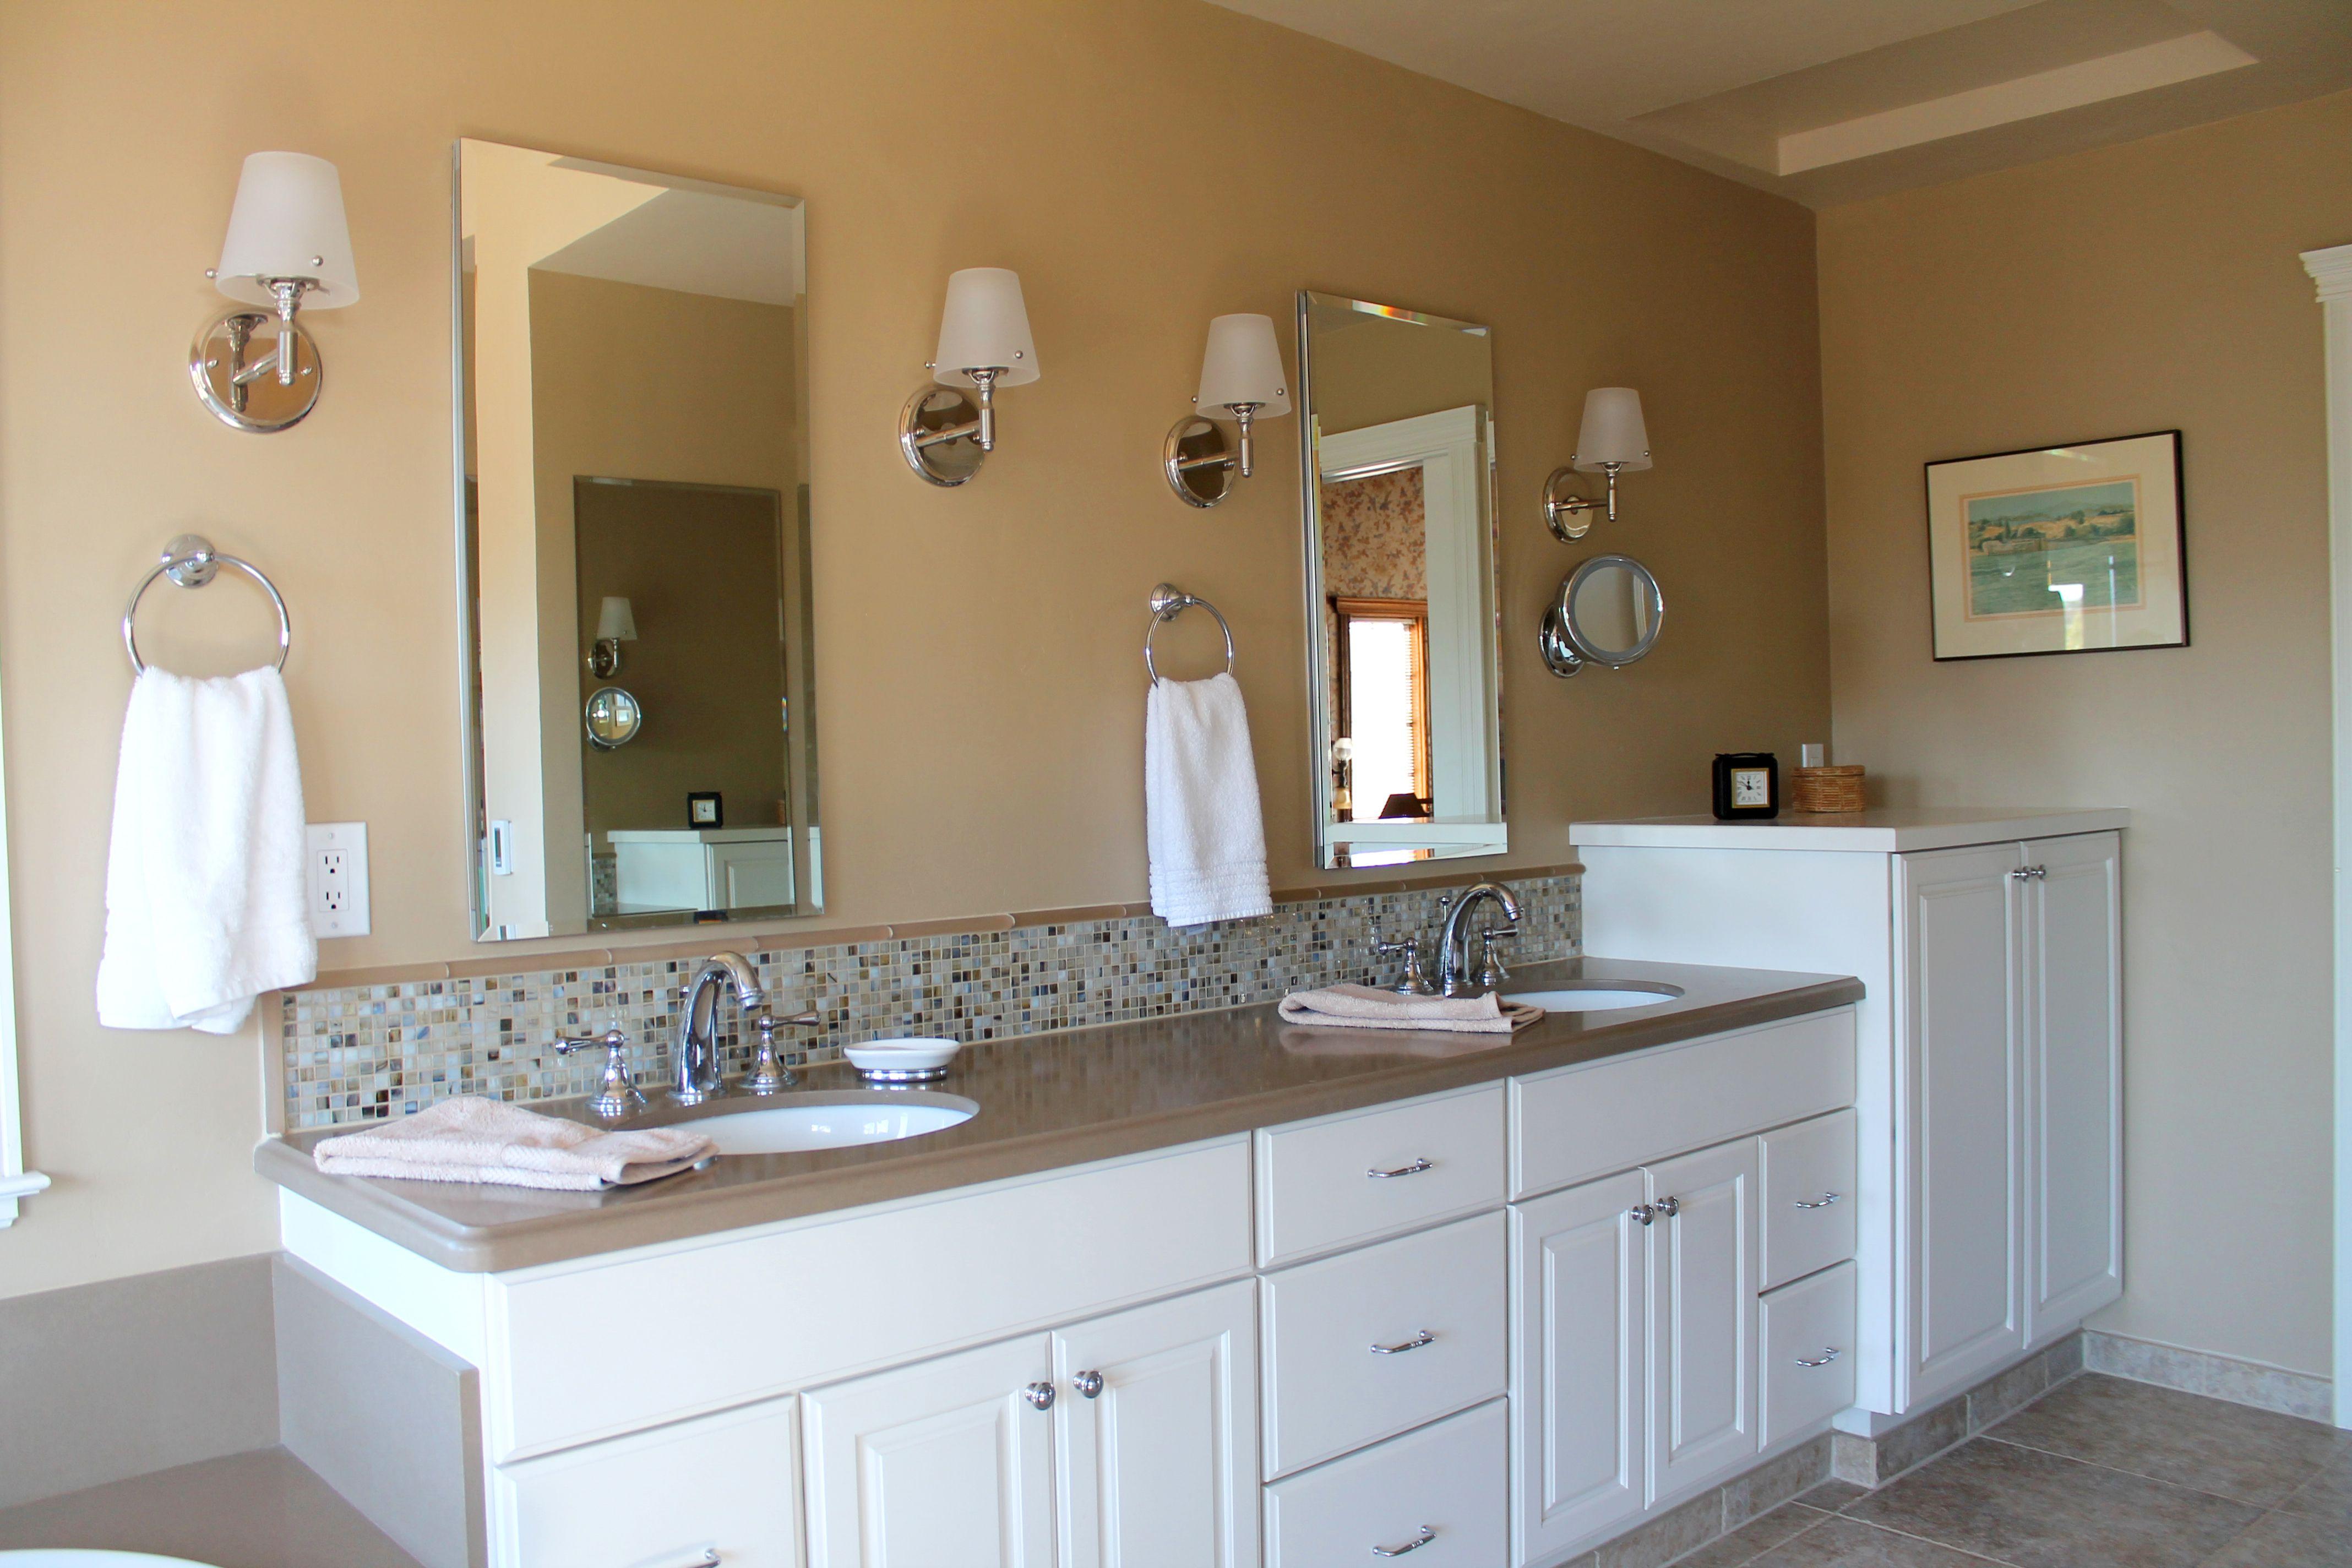 Santa Cruz Kitchen U0026 Bath Bathroom Design, Kitchen Design, Have A Question?  Contact Our Team Or Visit Our Showroom For A Free Consultation